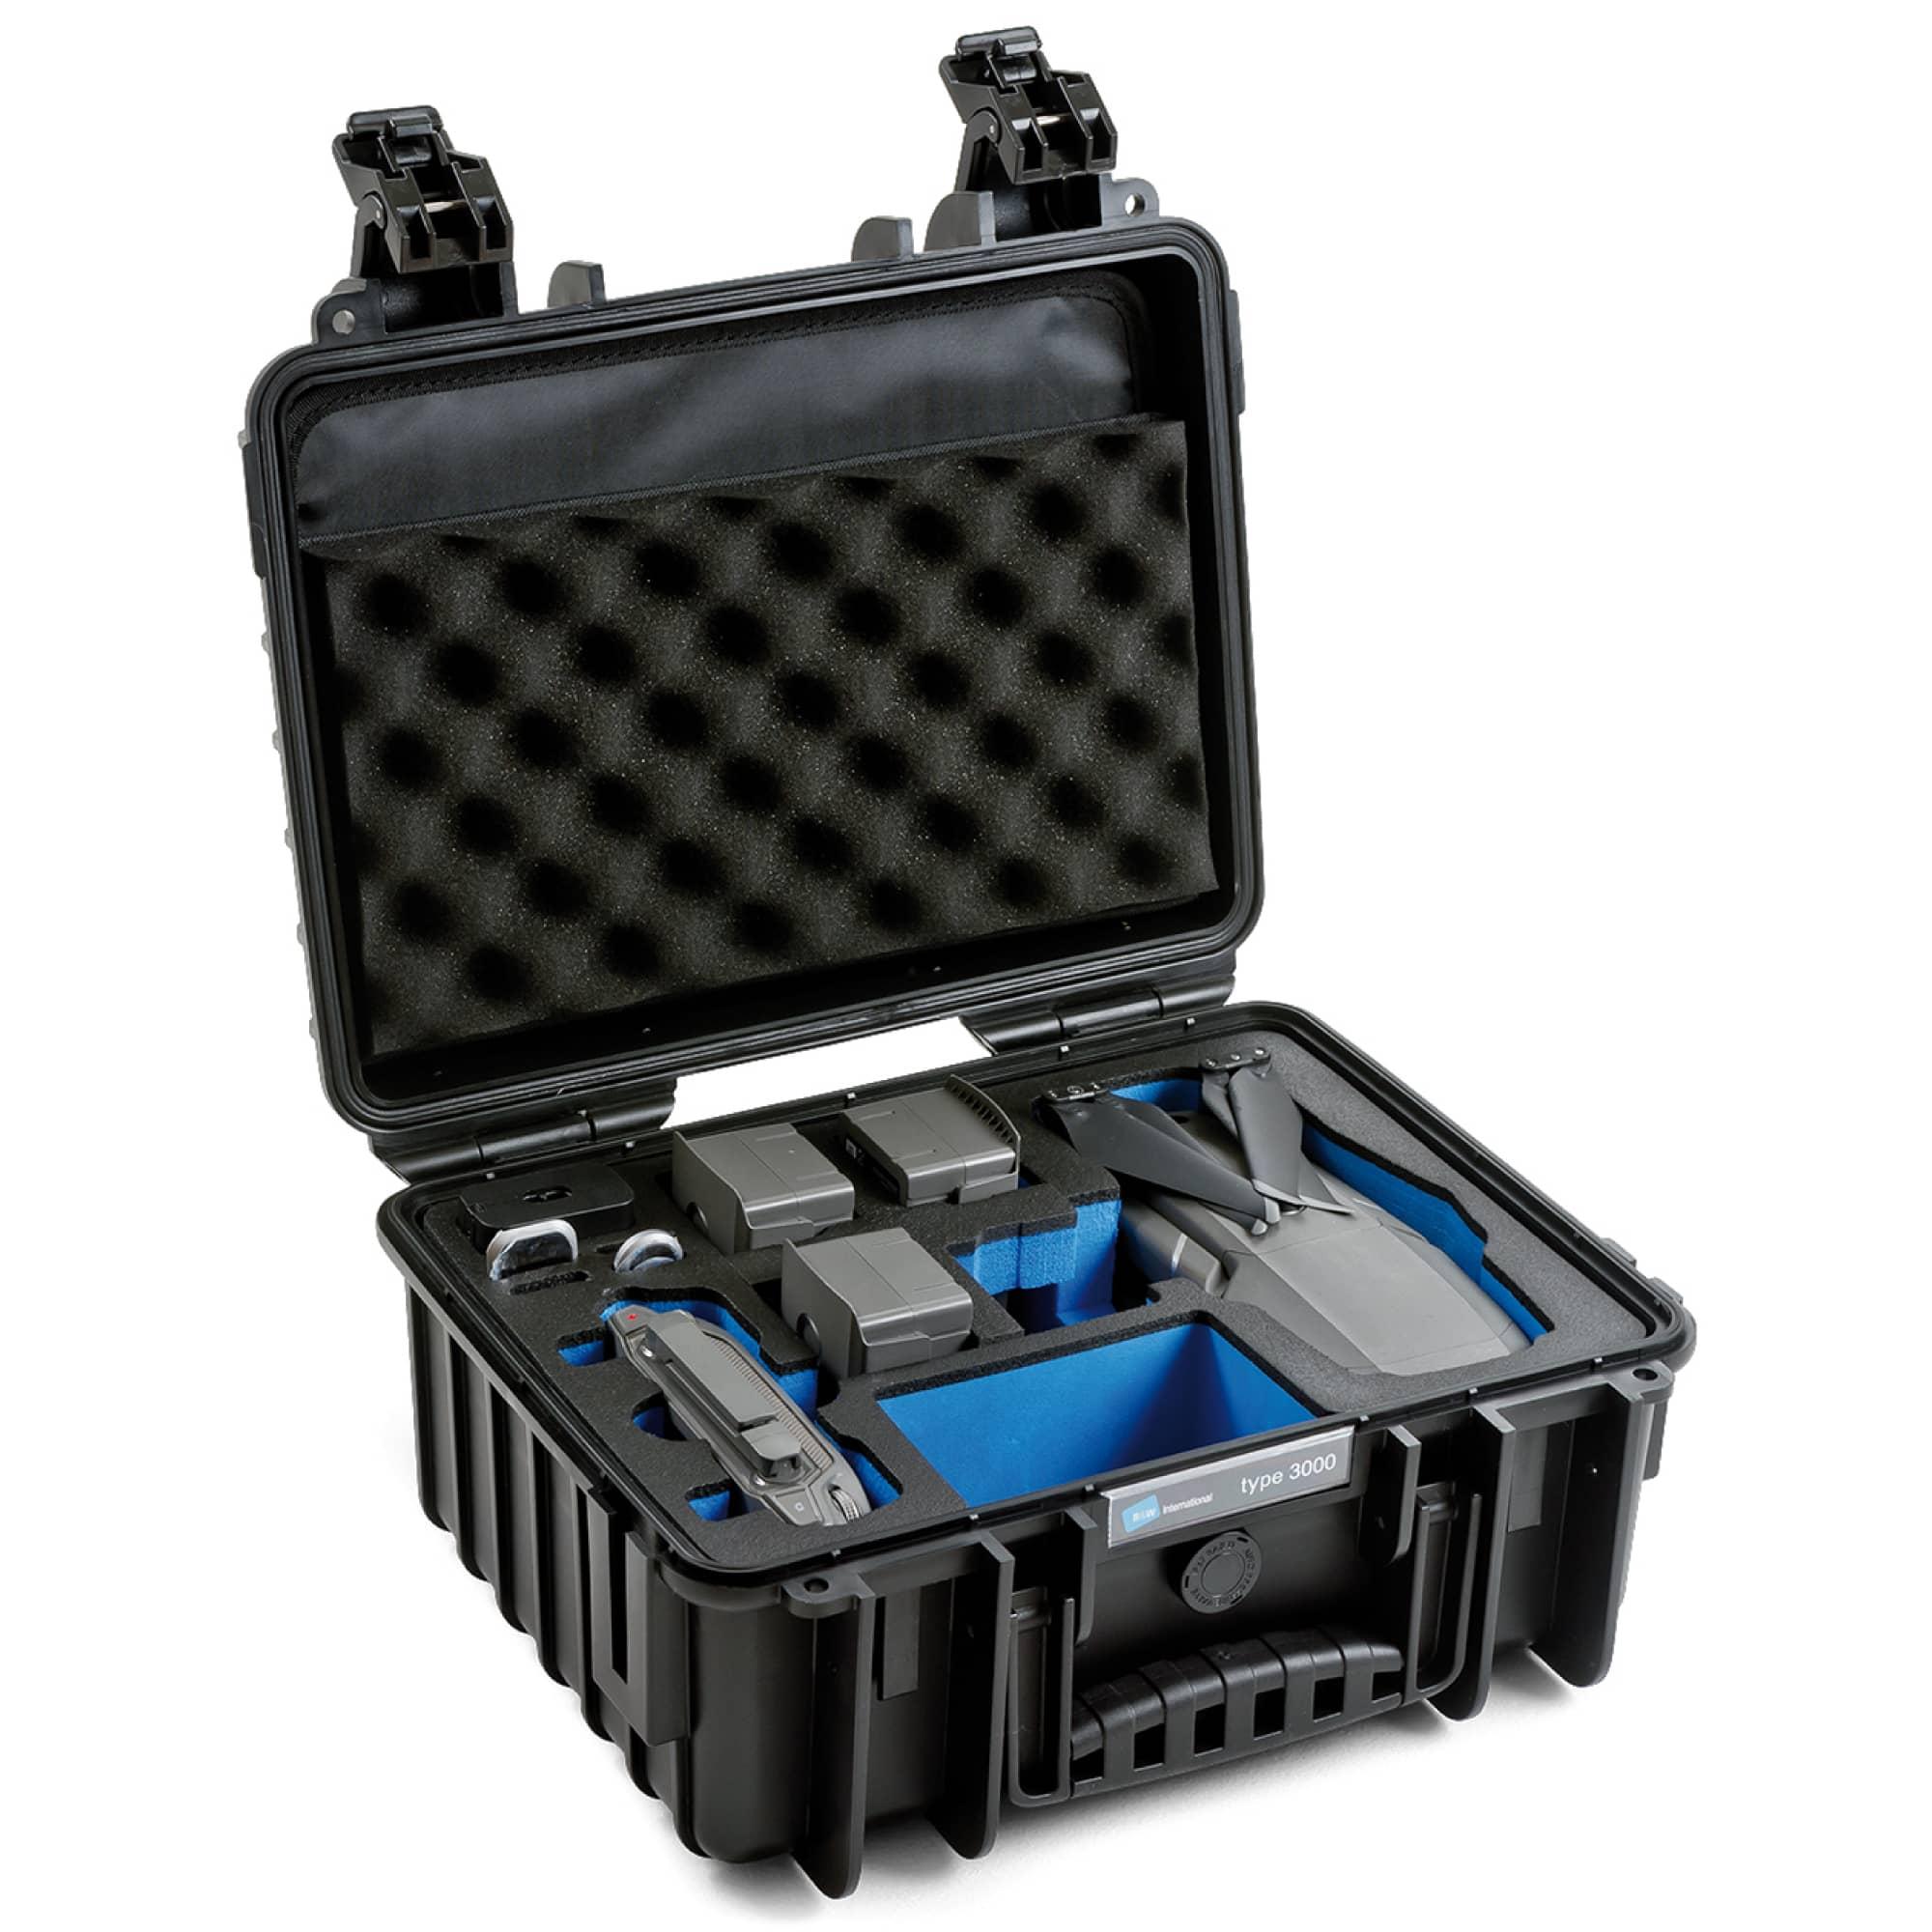 B&W Special Case Typ 3000 with 3D foam for DJI Mavic 2